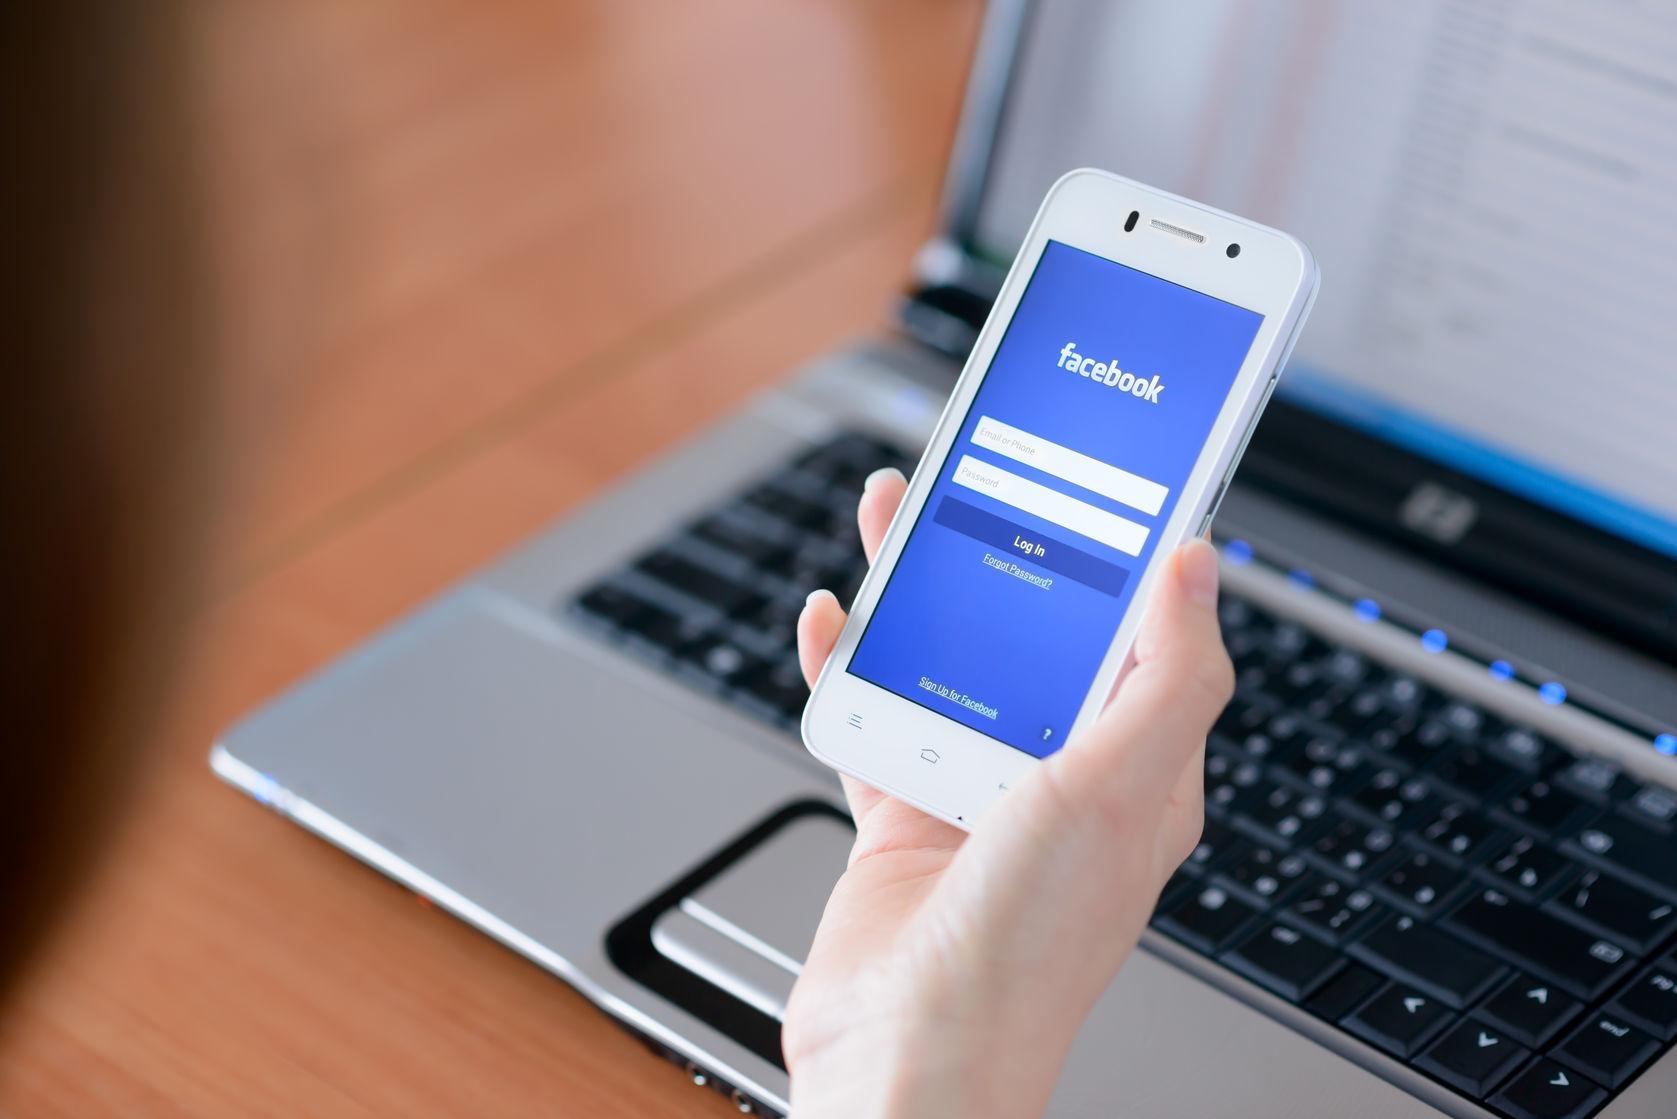 Facebook - Instant Articles en el smartphone